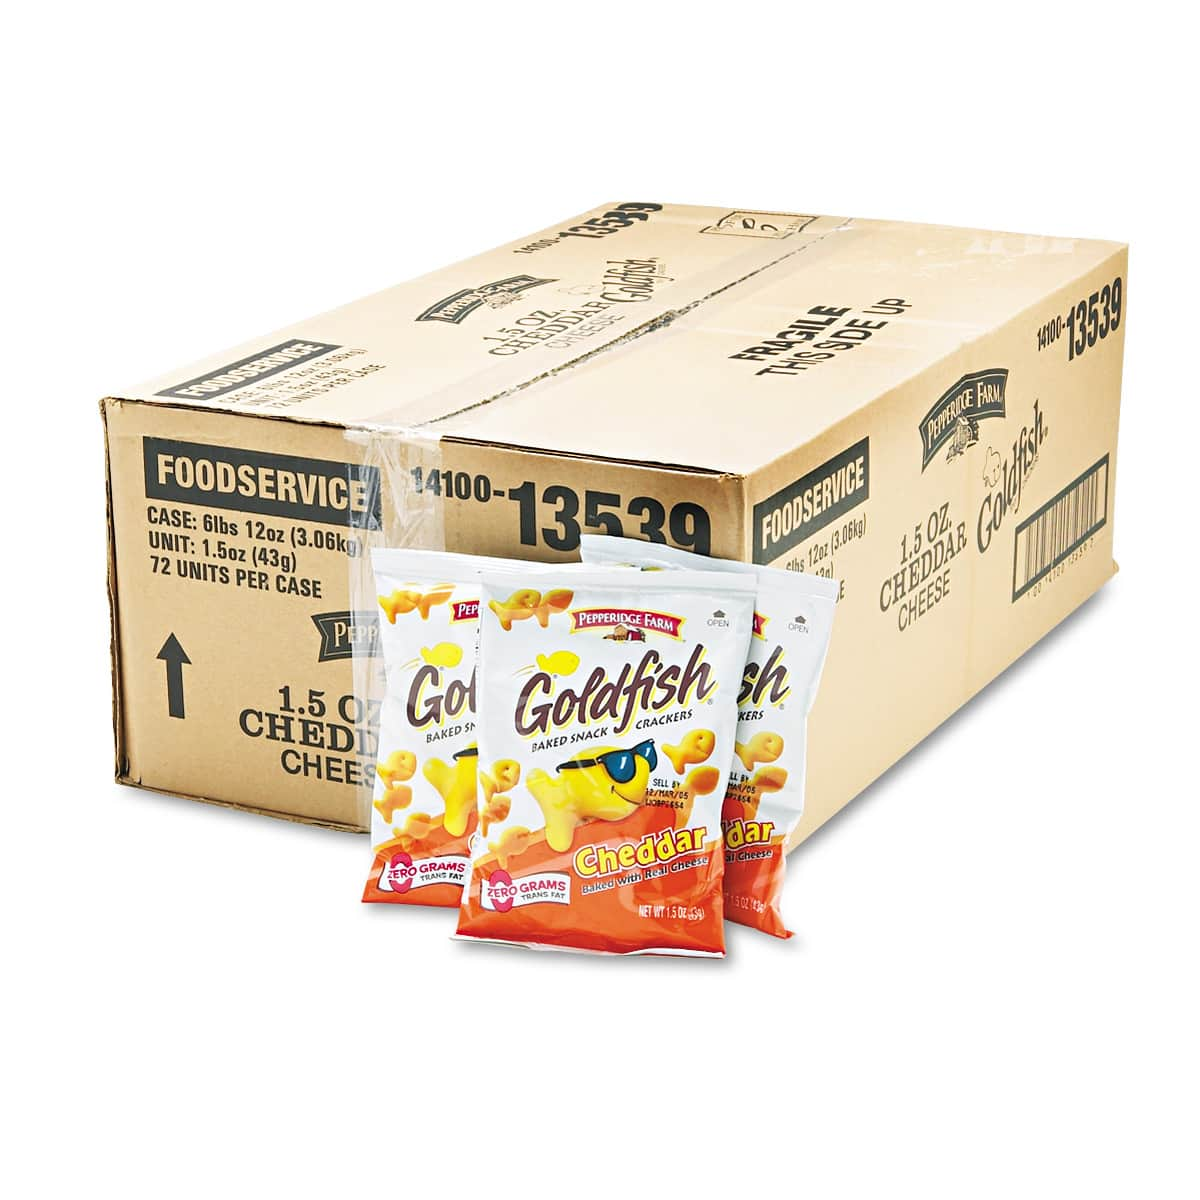 72-Pack 1.5-Oz Pepperidge Farm Goldfish Crackers (Cheddar) $23.15 + Free Shipping